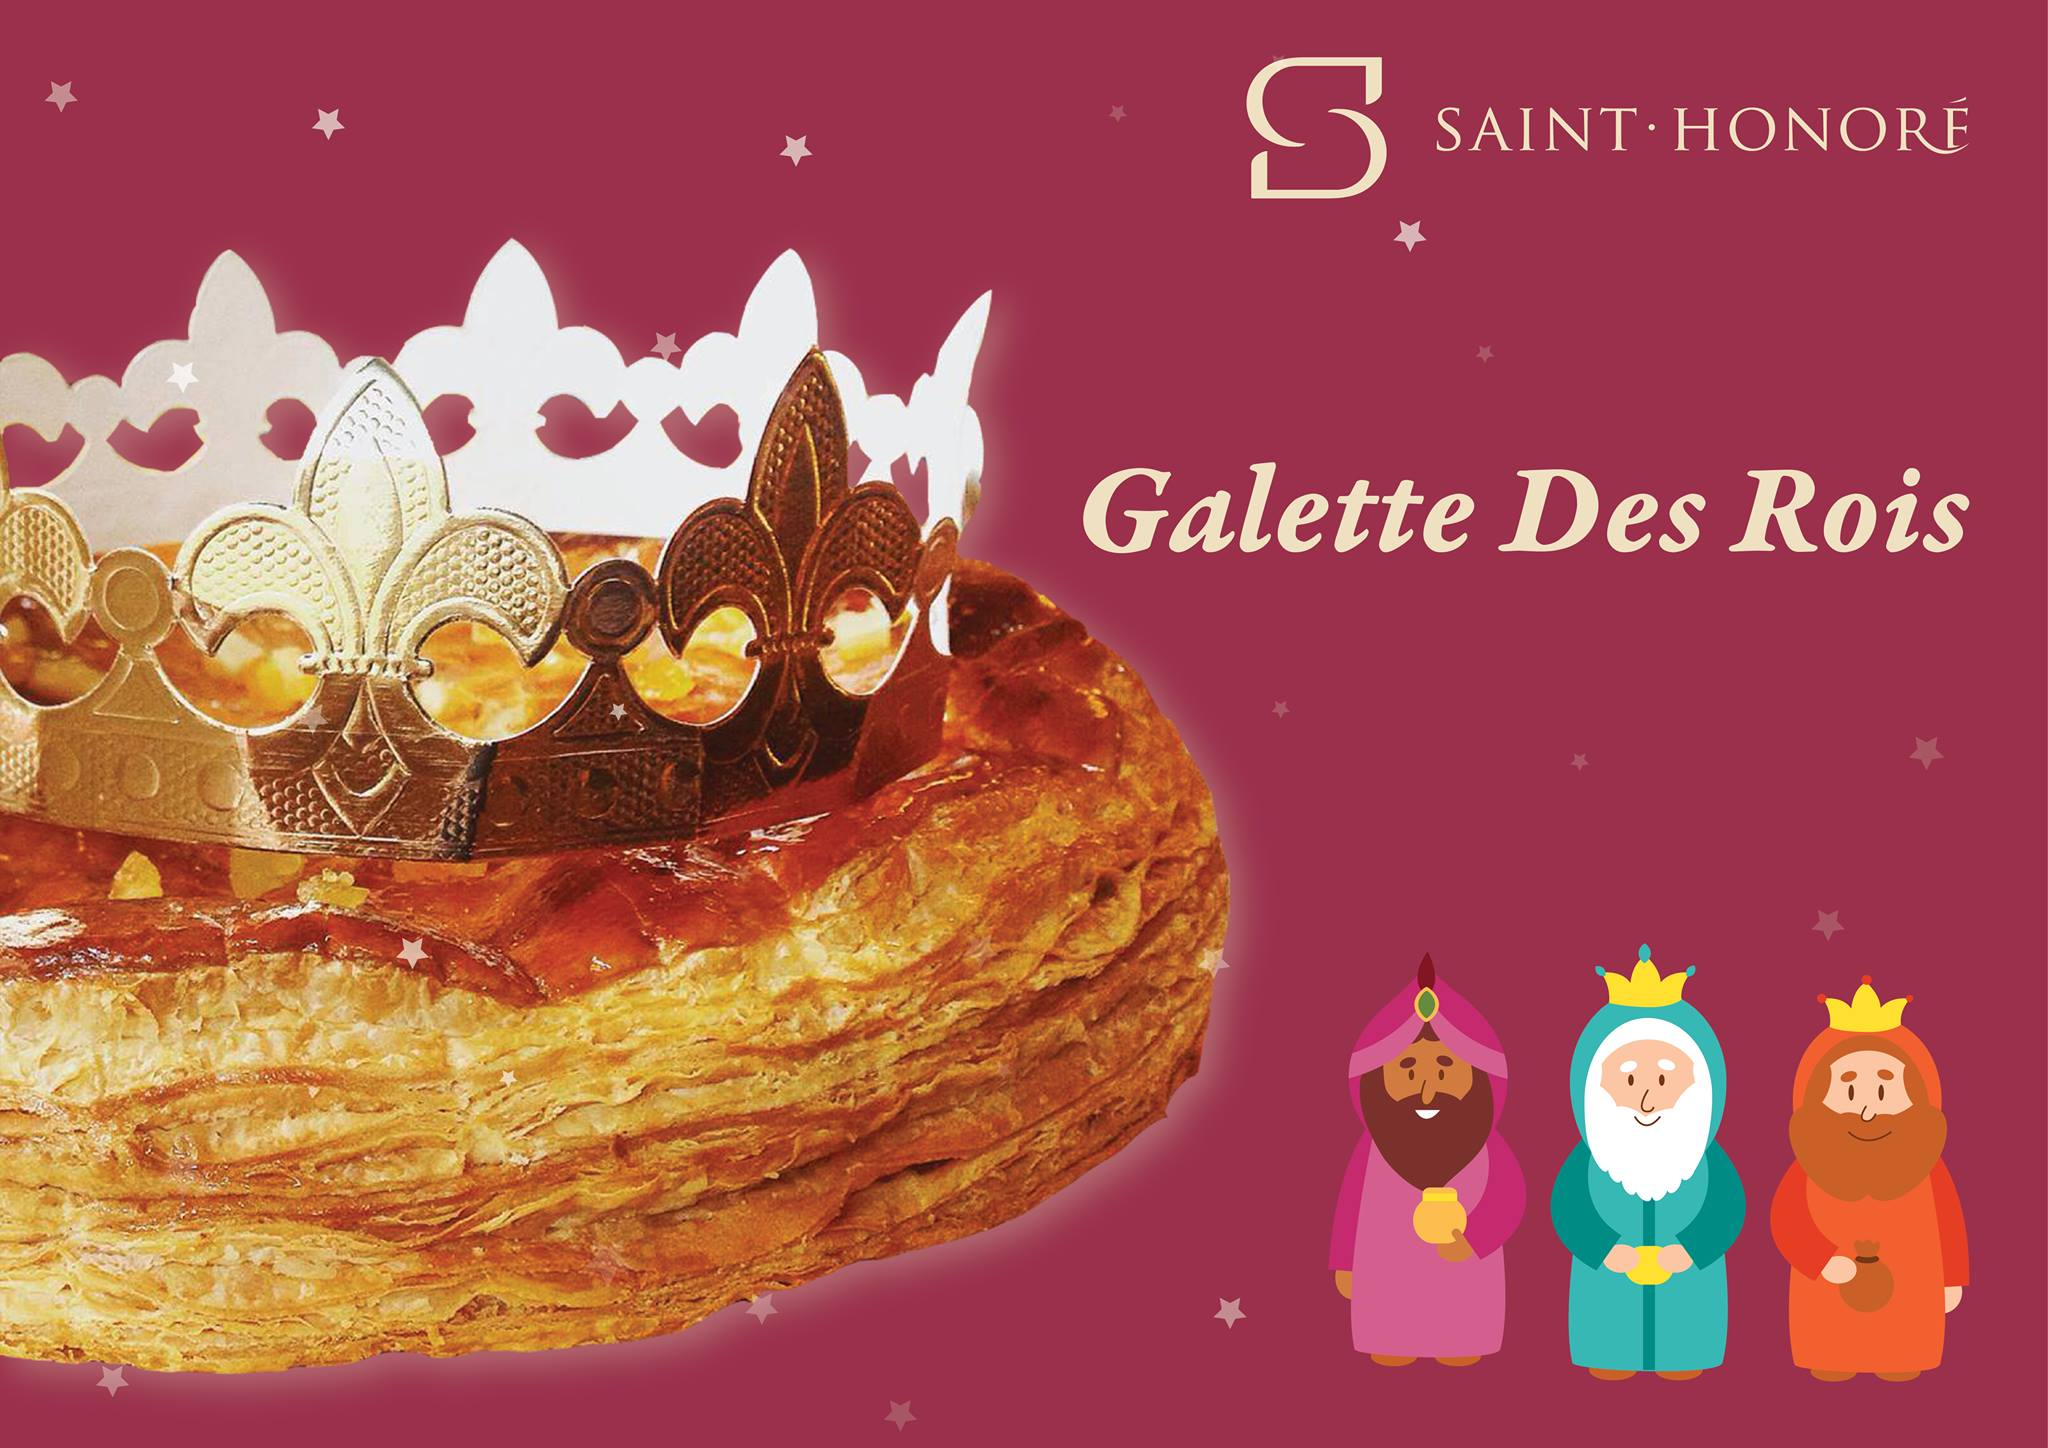 Galette Saint Honoré.jpg